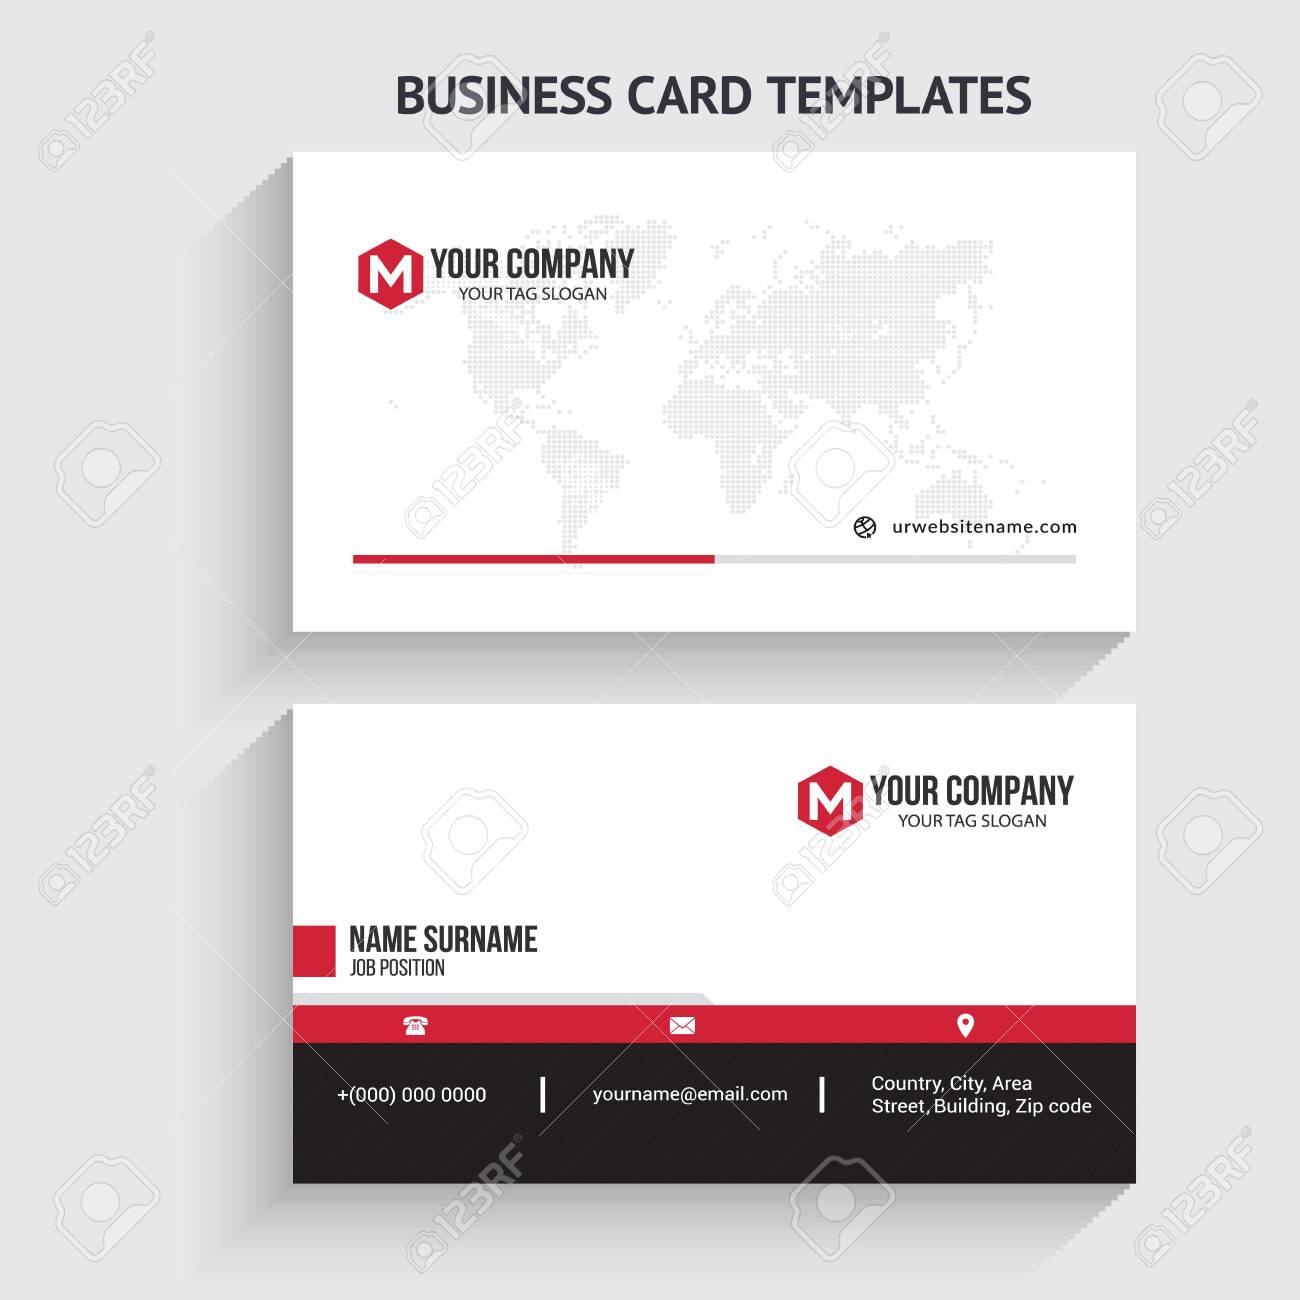 Modern Business Card Template. Stationery Design, Flat Design, Print Template, Vector illustration - 149444420